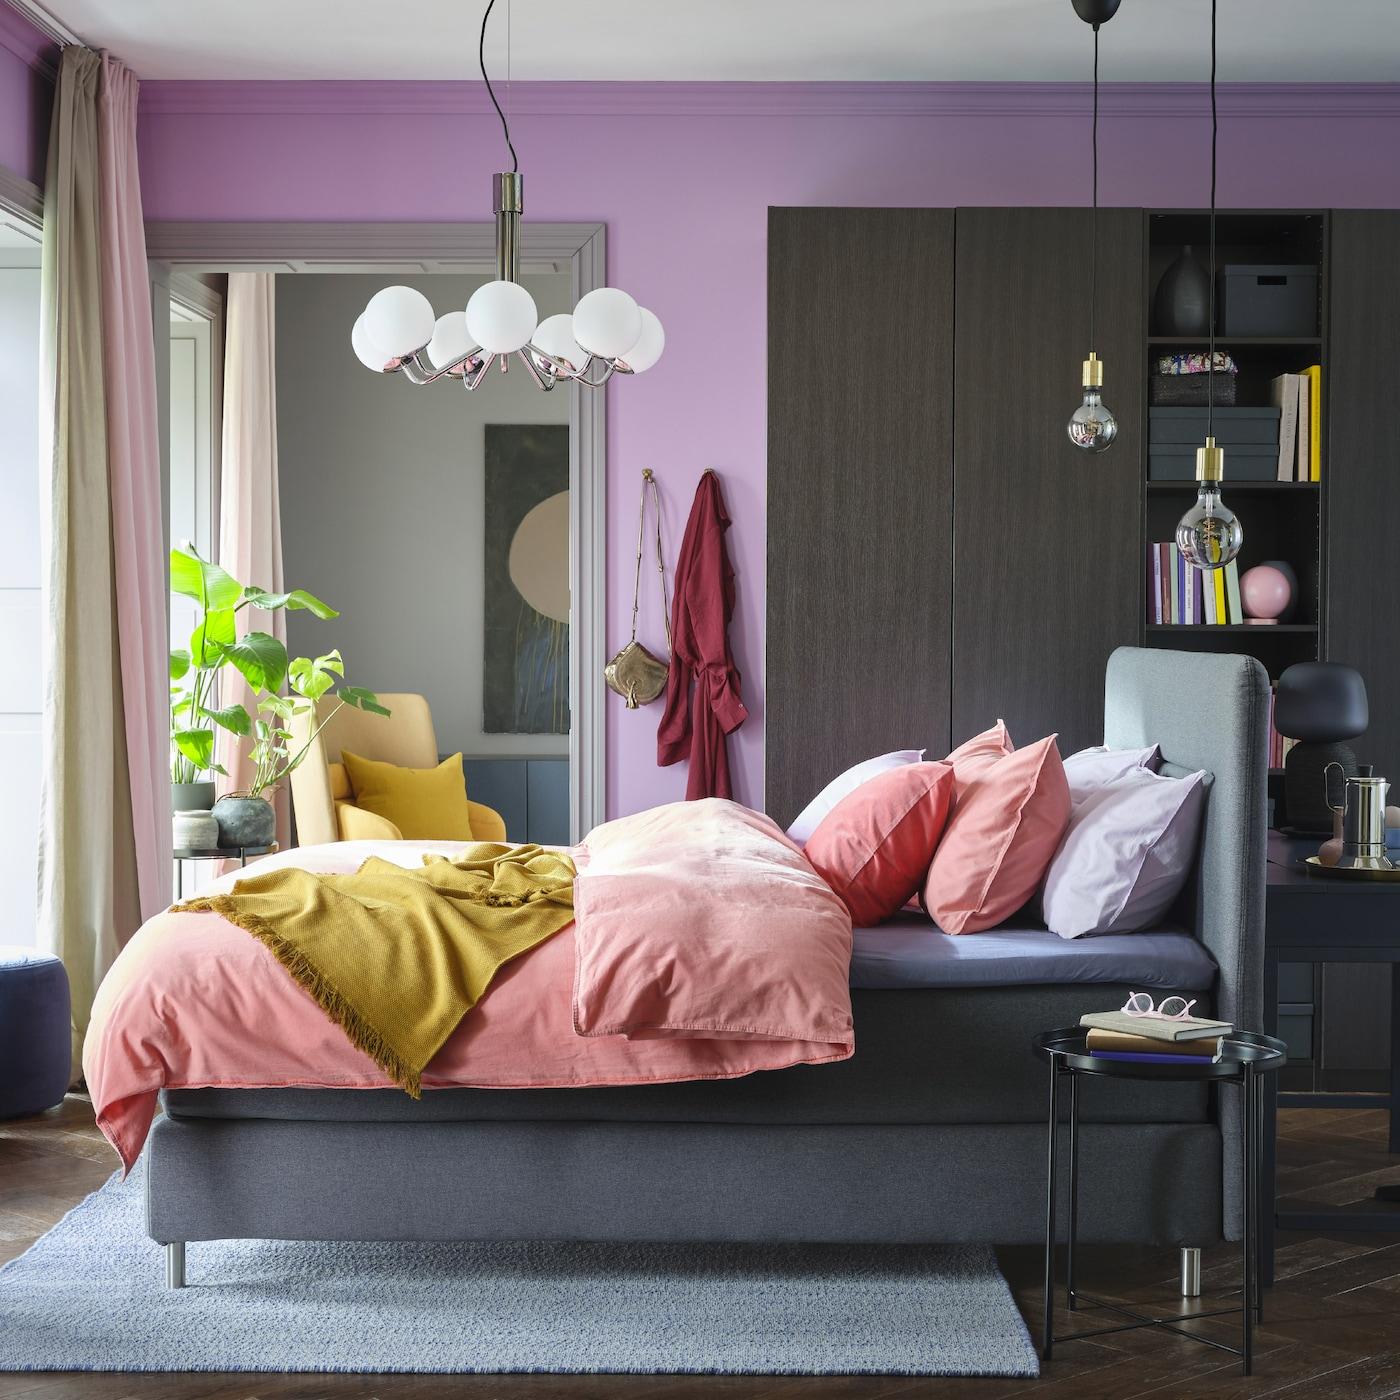 Slaapkamer Ideeen Lila.Slaapkamer Inspiratie Ikea Ikea